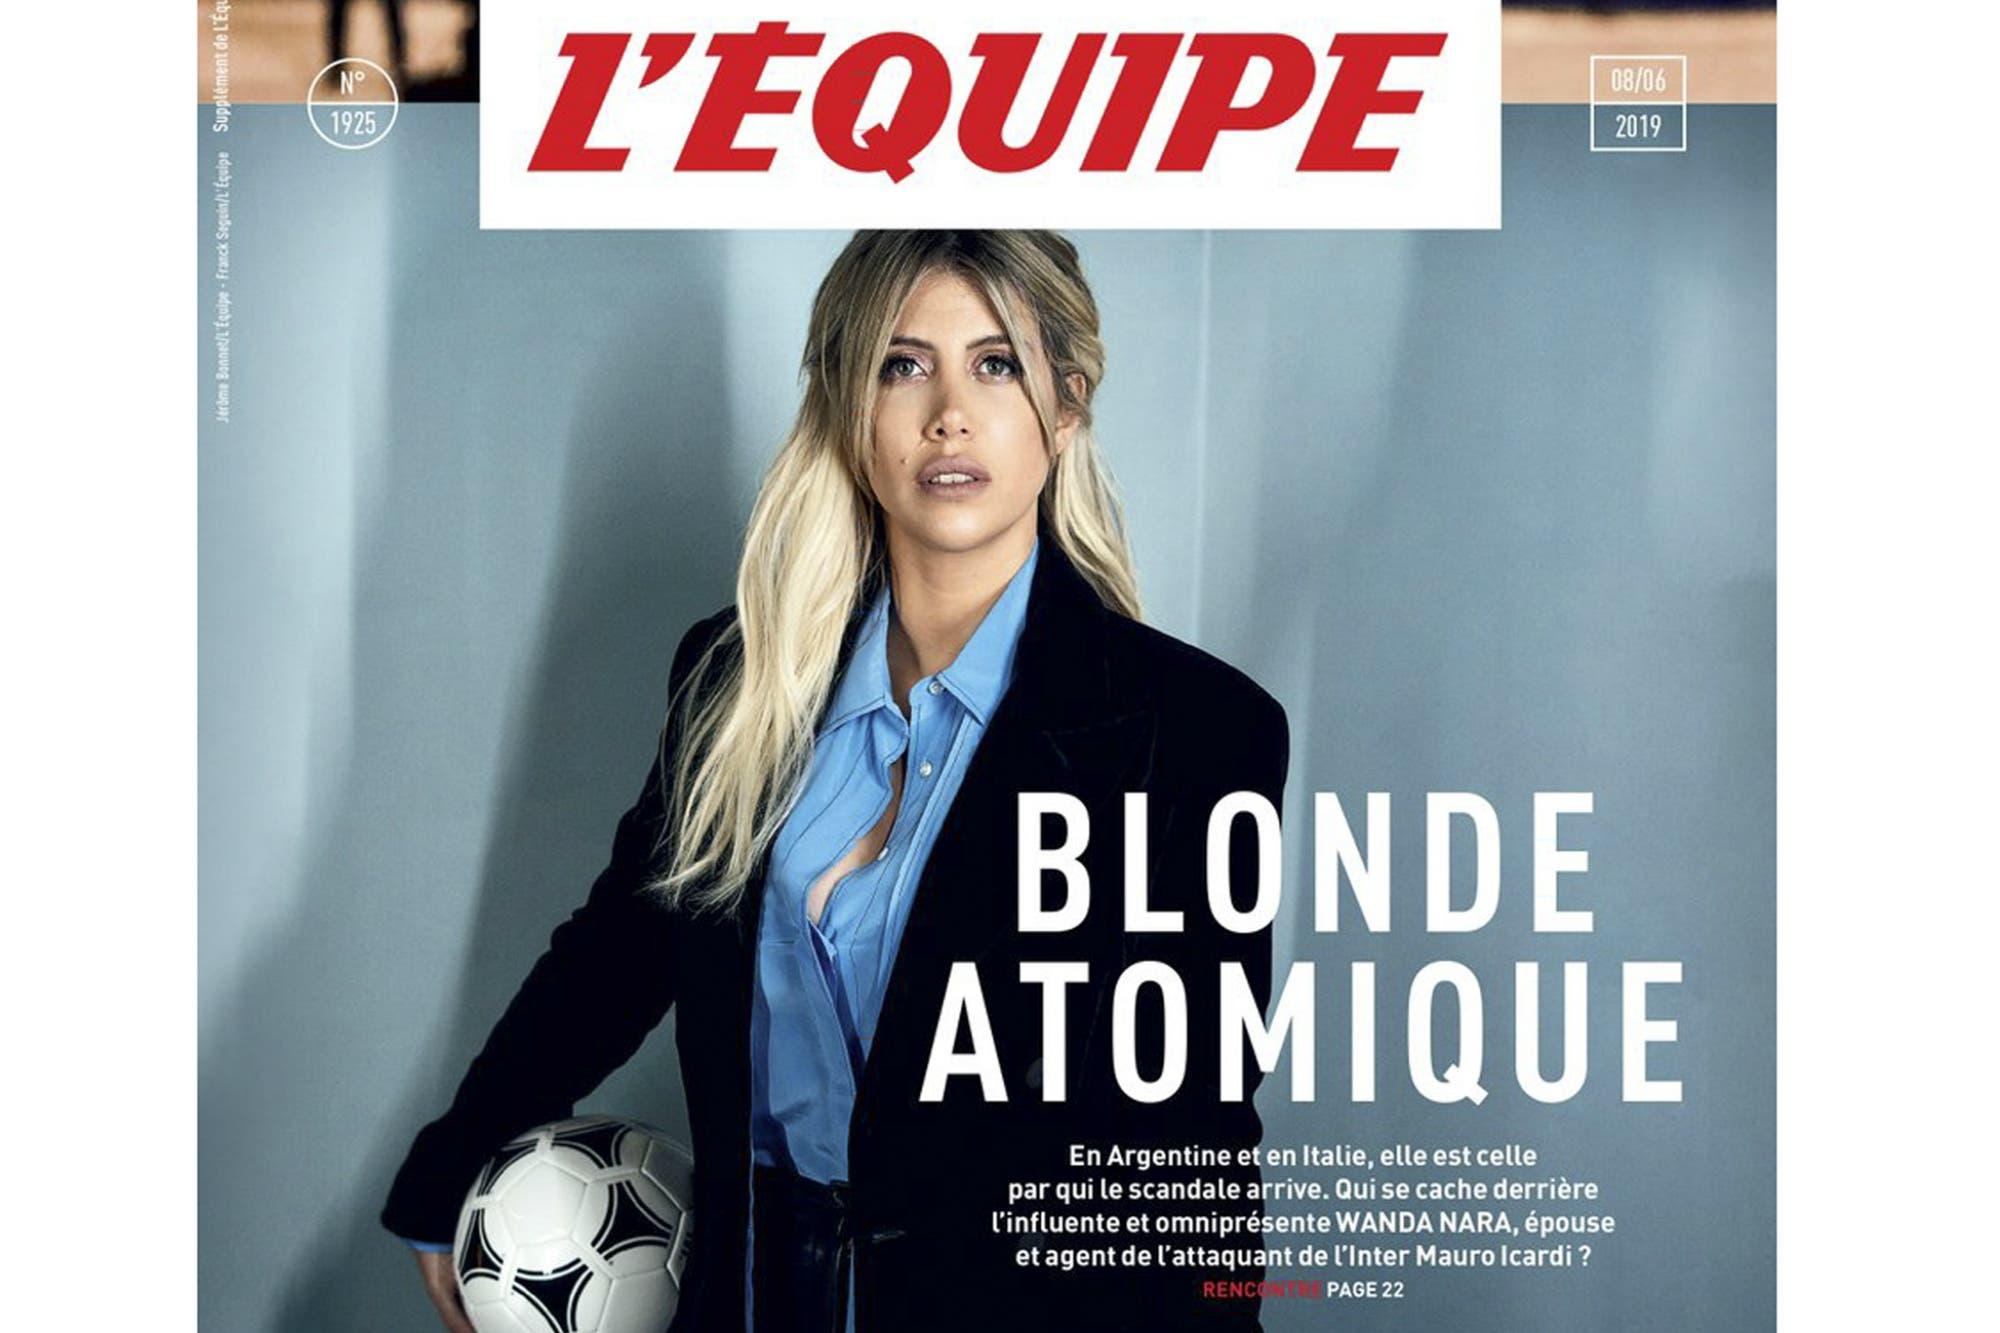 "Wanda Nara, en la tapa de L'Equipe: ""Rubia atómica"""